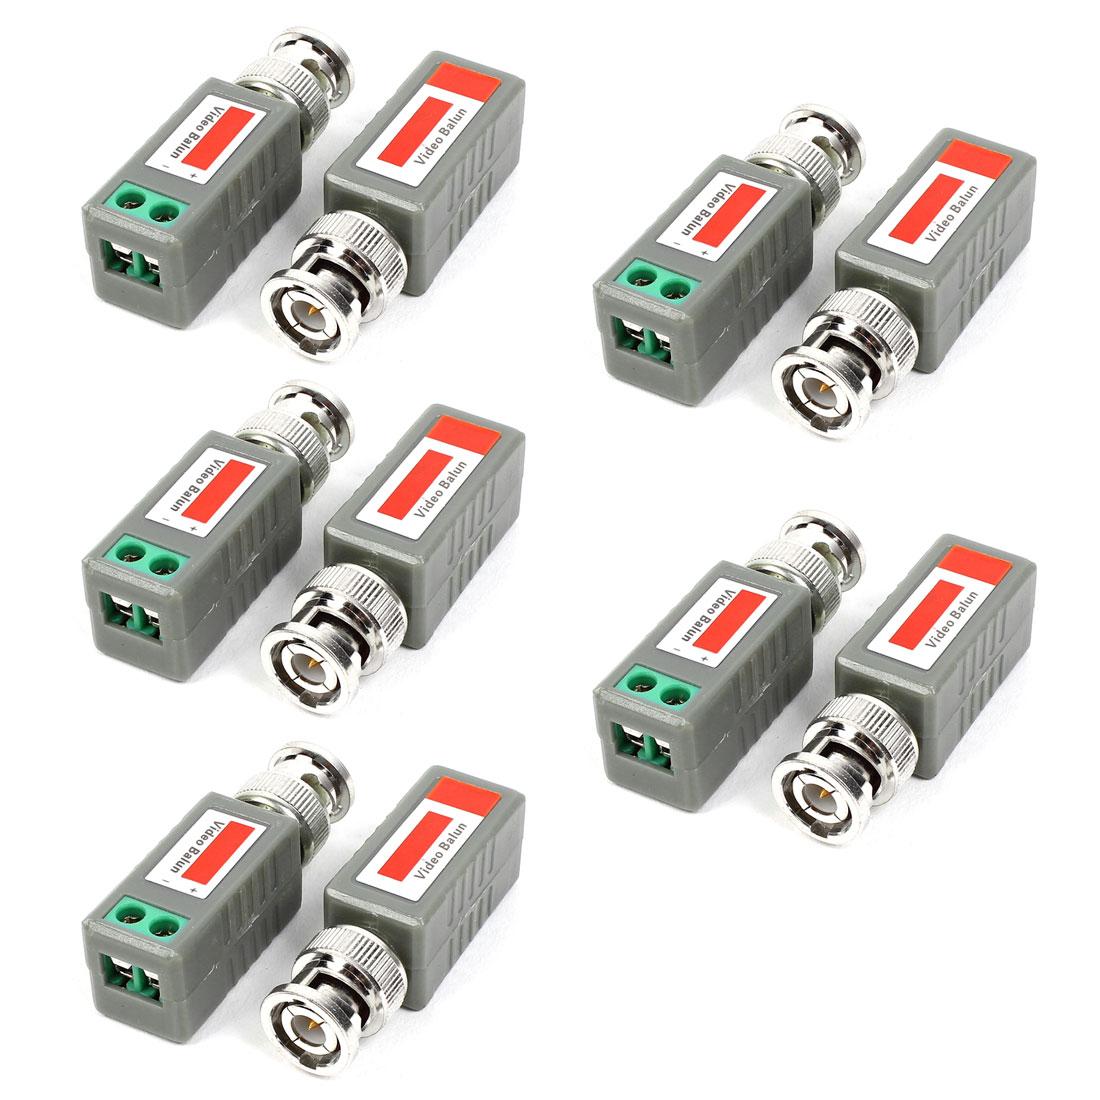 10pcs BNC Male Connector to AV Screw Terminal Plug Adapter Video Balun Transceiver